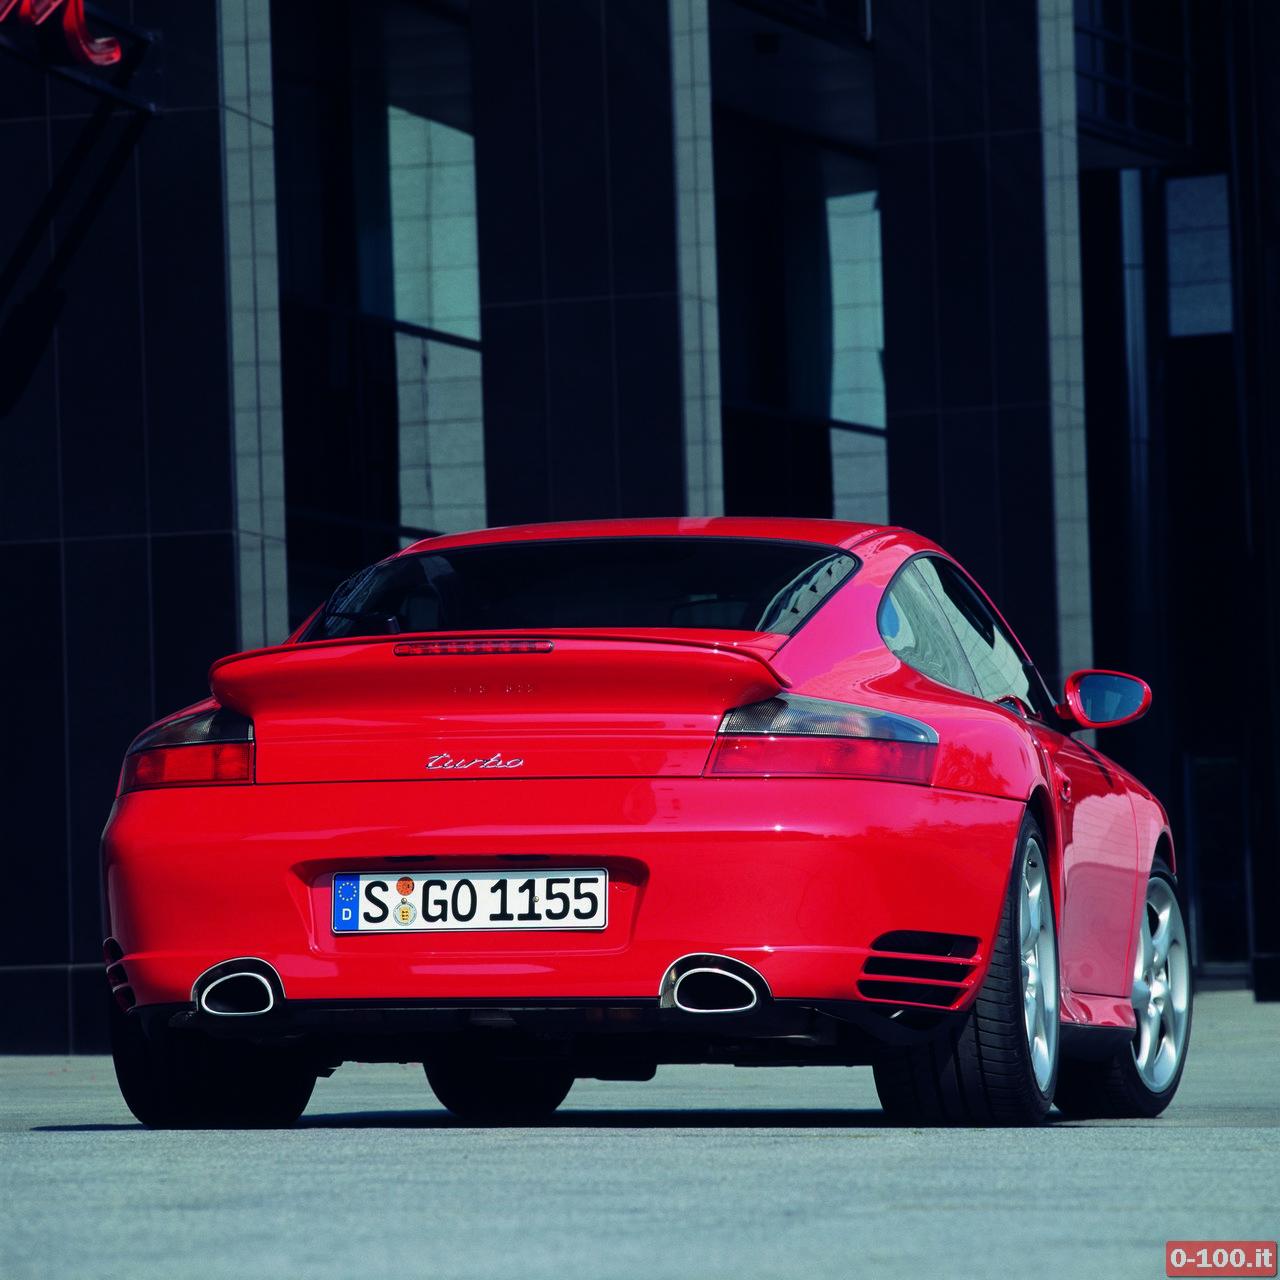 porsche_911-930-964-993-996-997_turbo_0-100_19